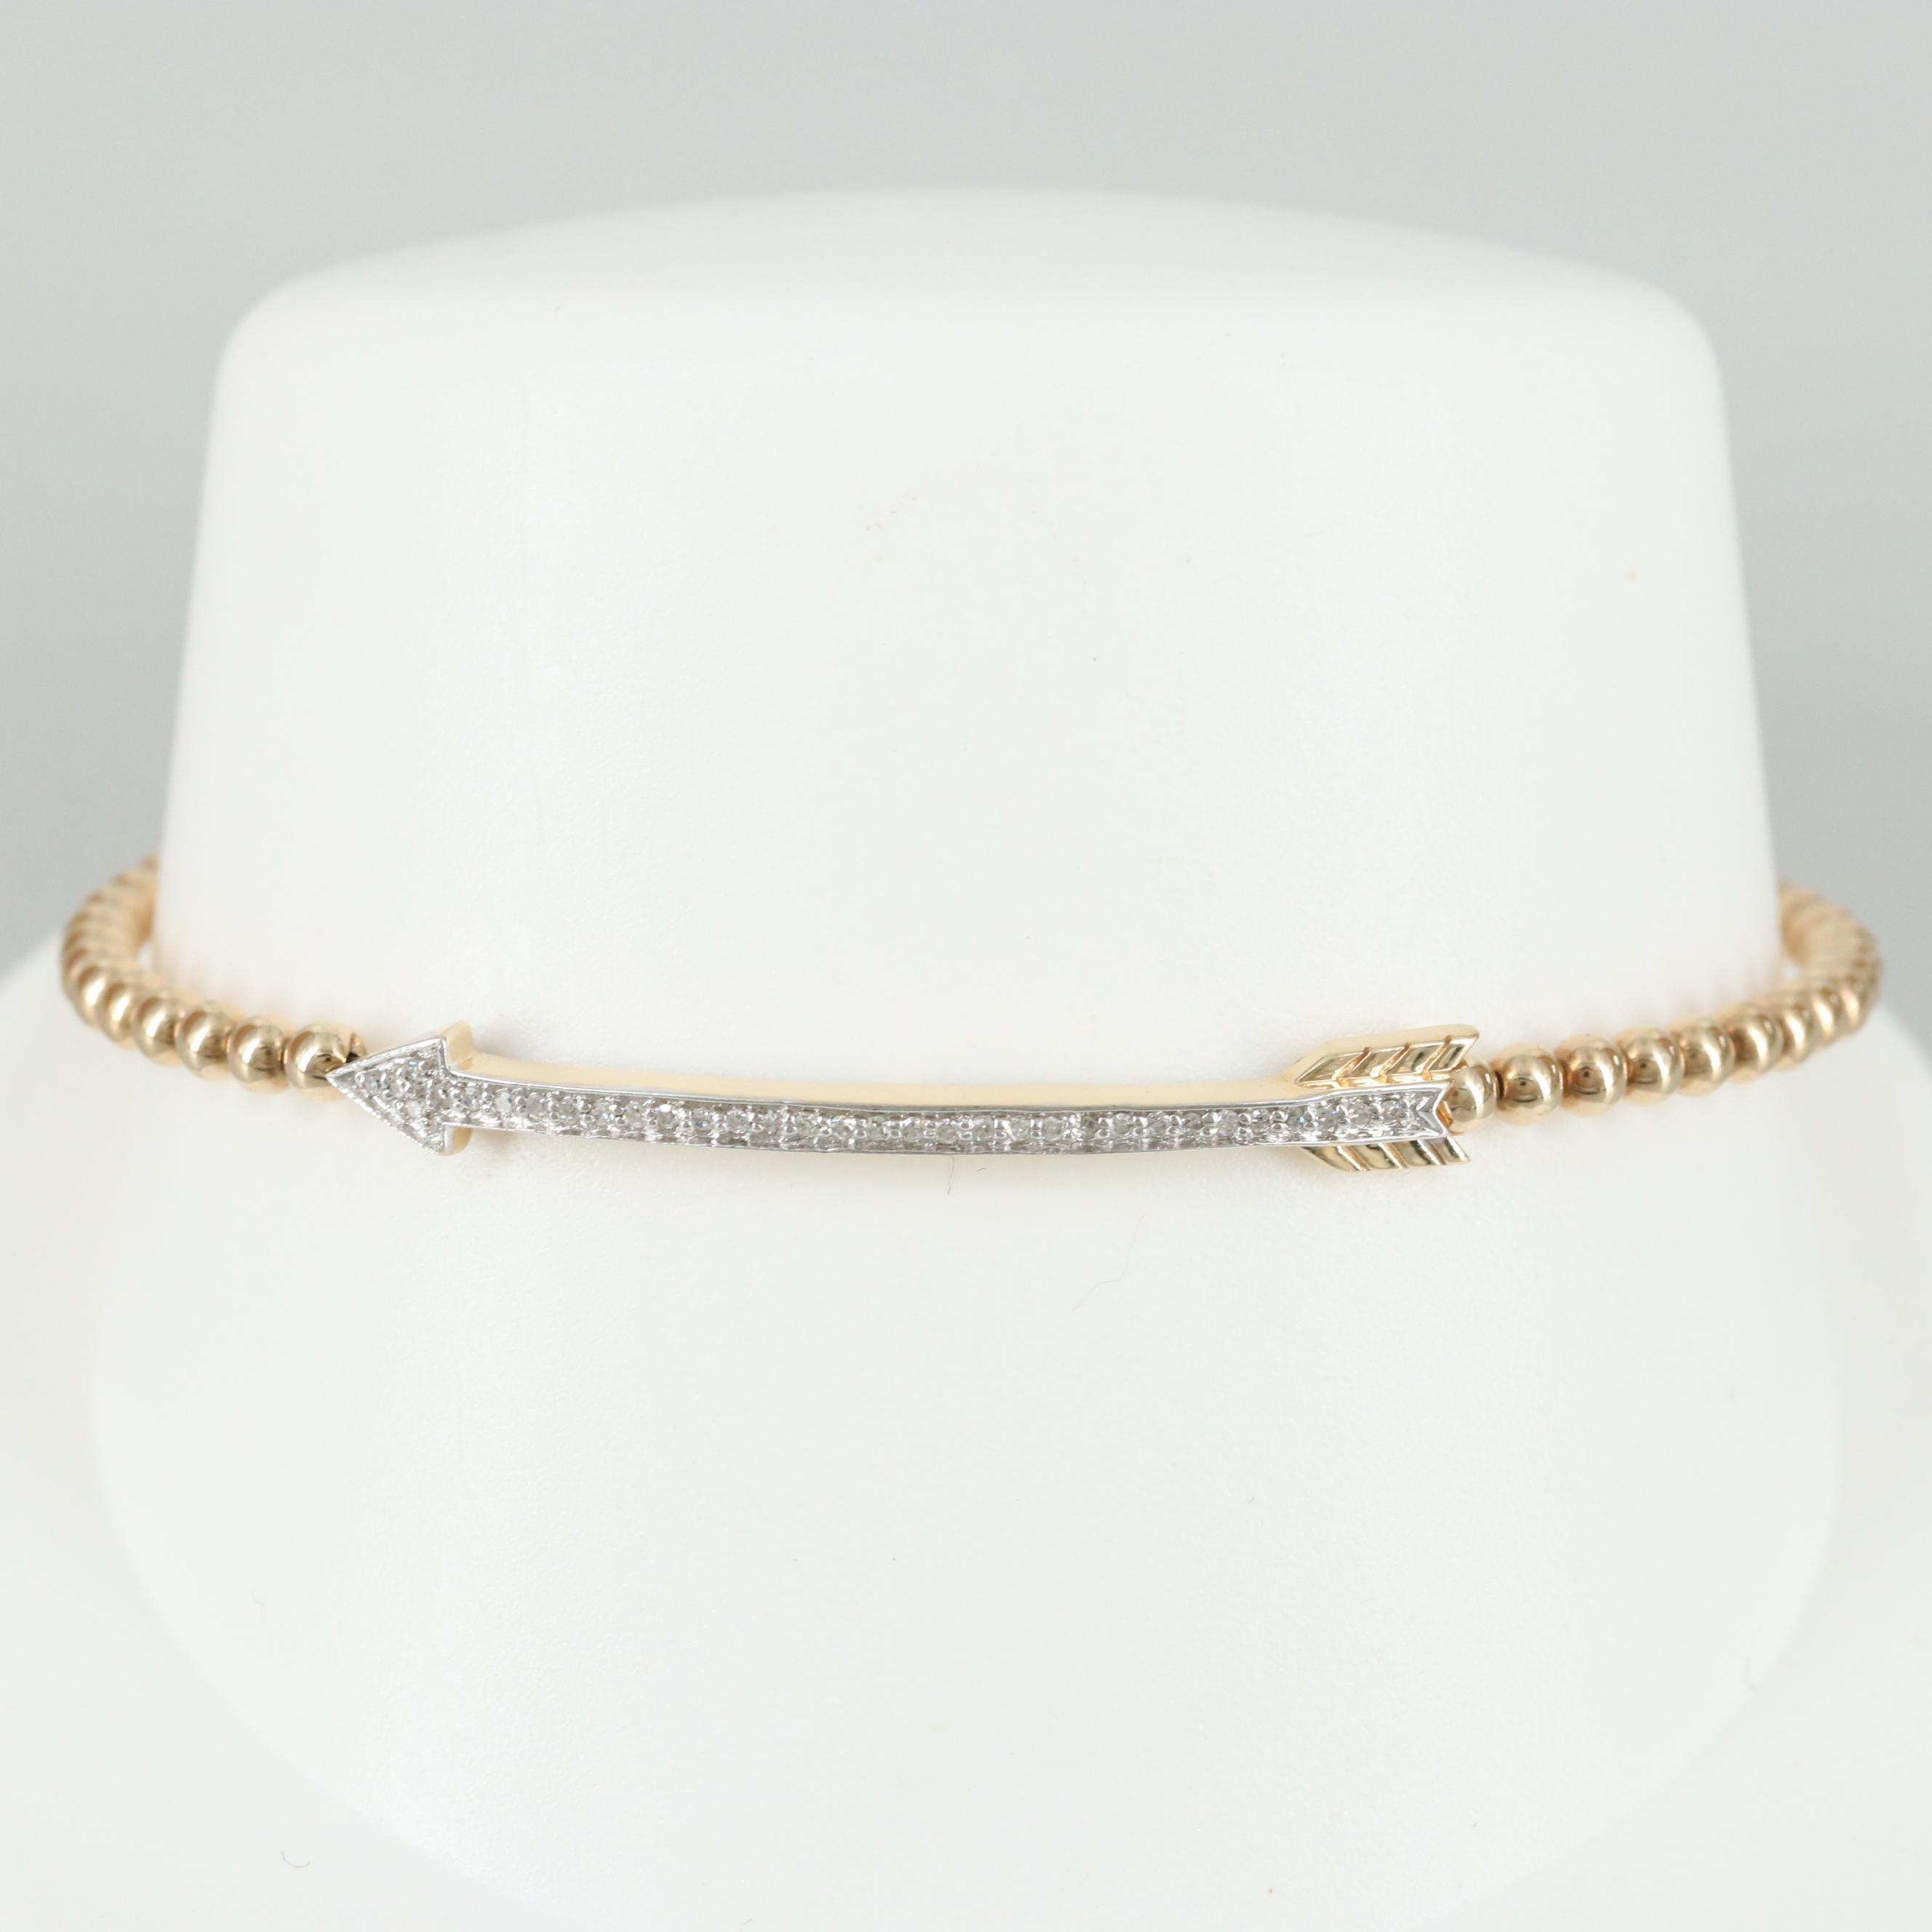 14K Yellow Gold Diamond Arrow Bracelet